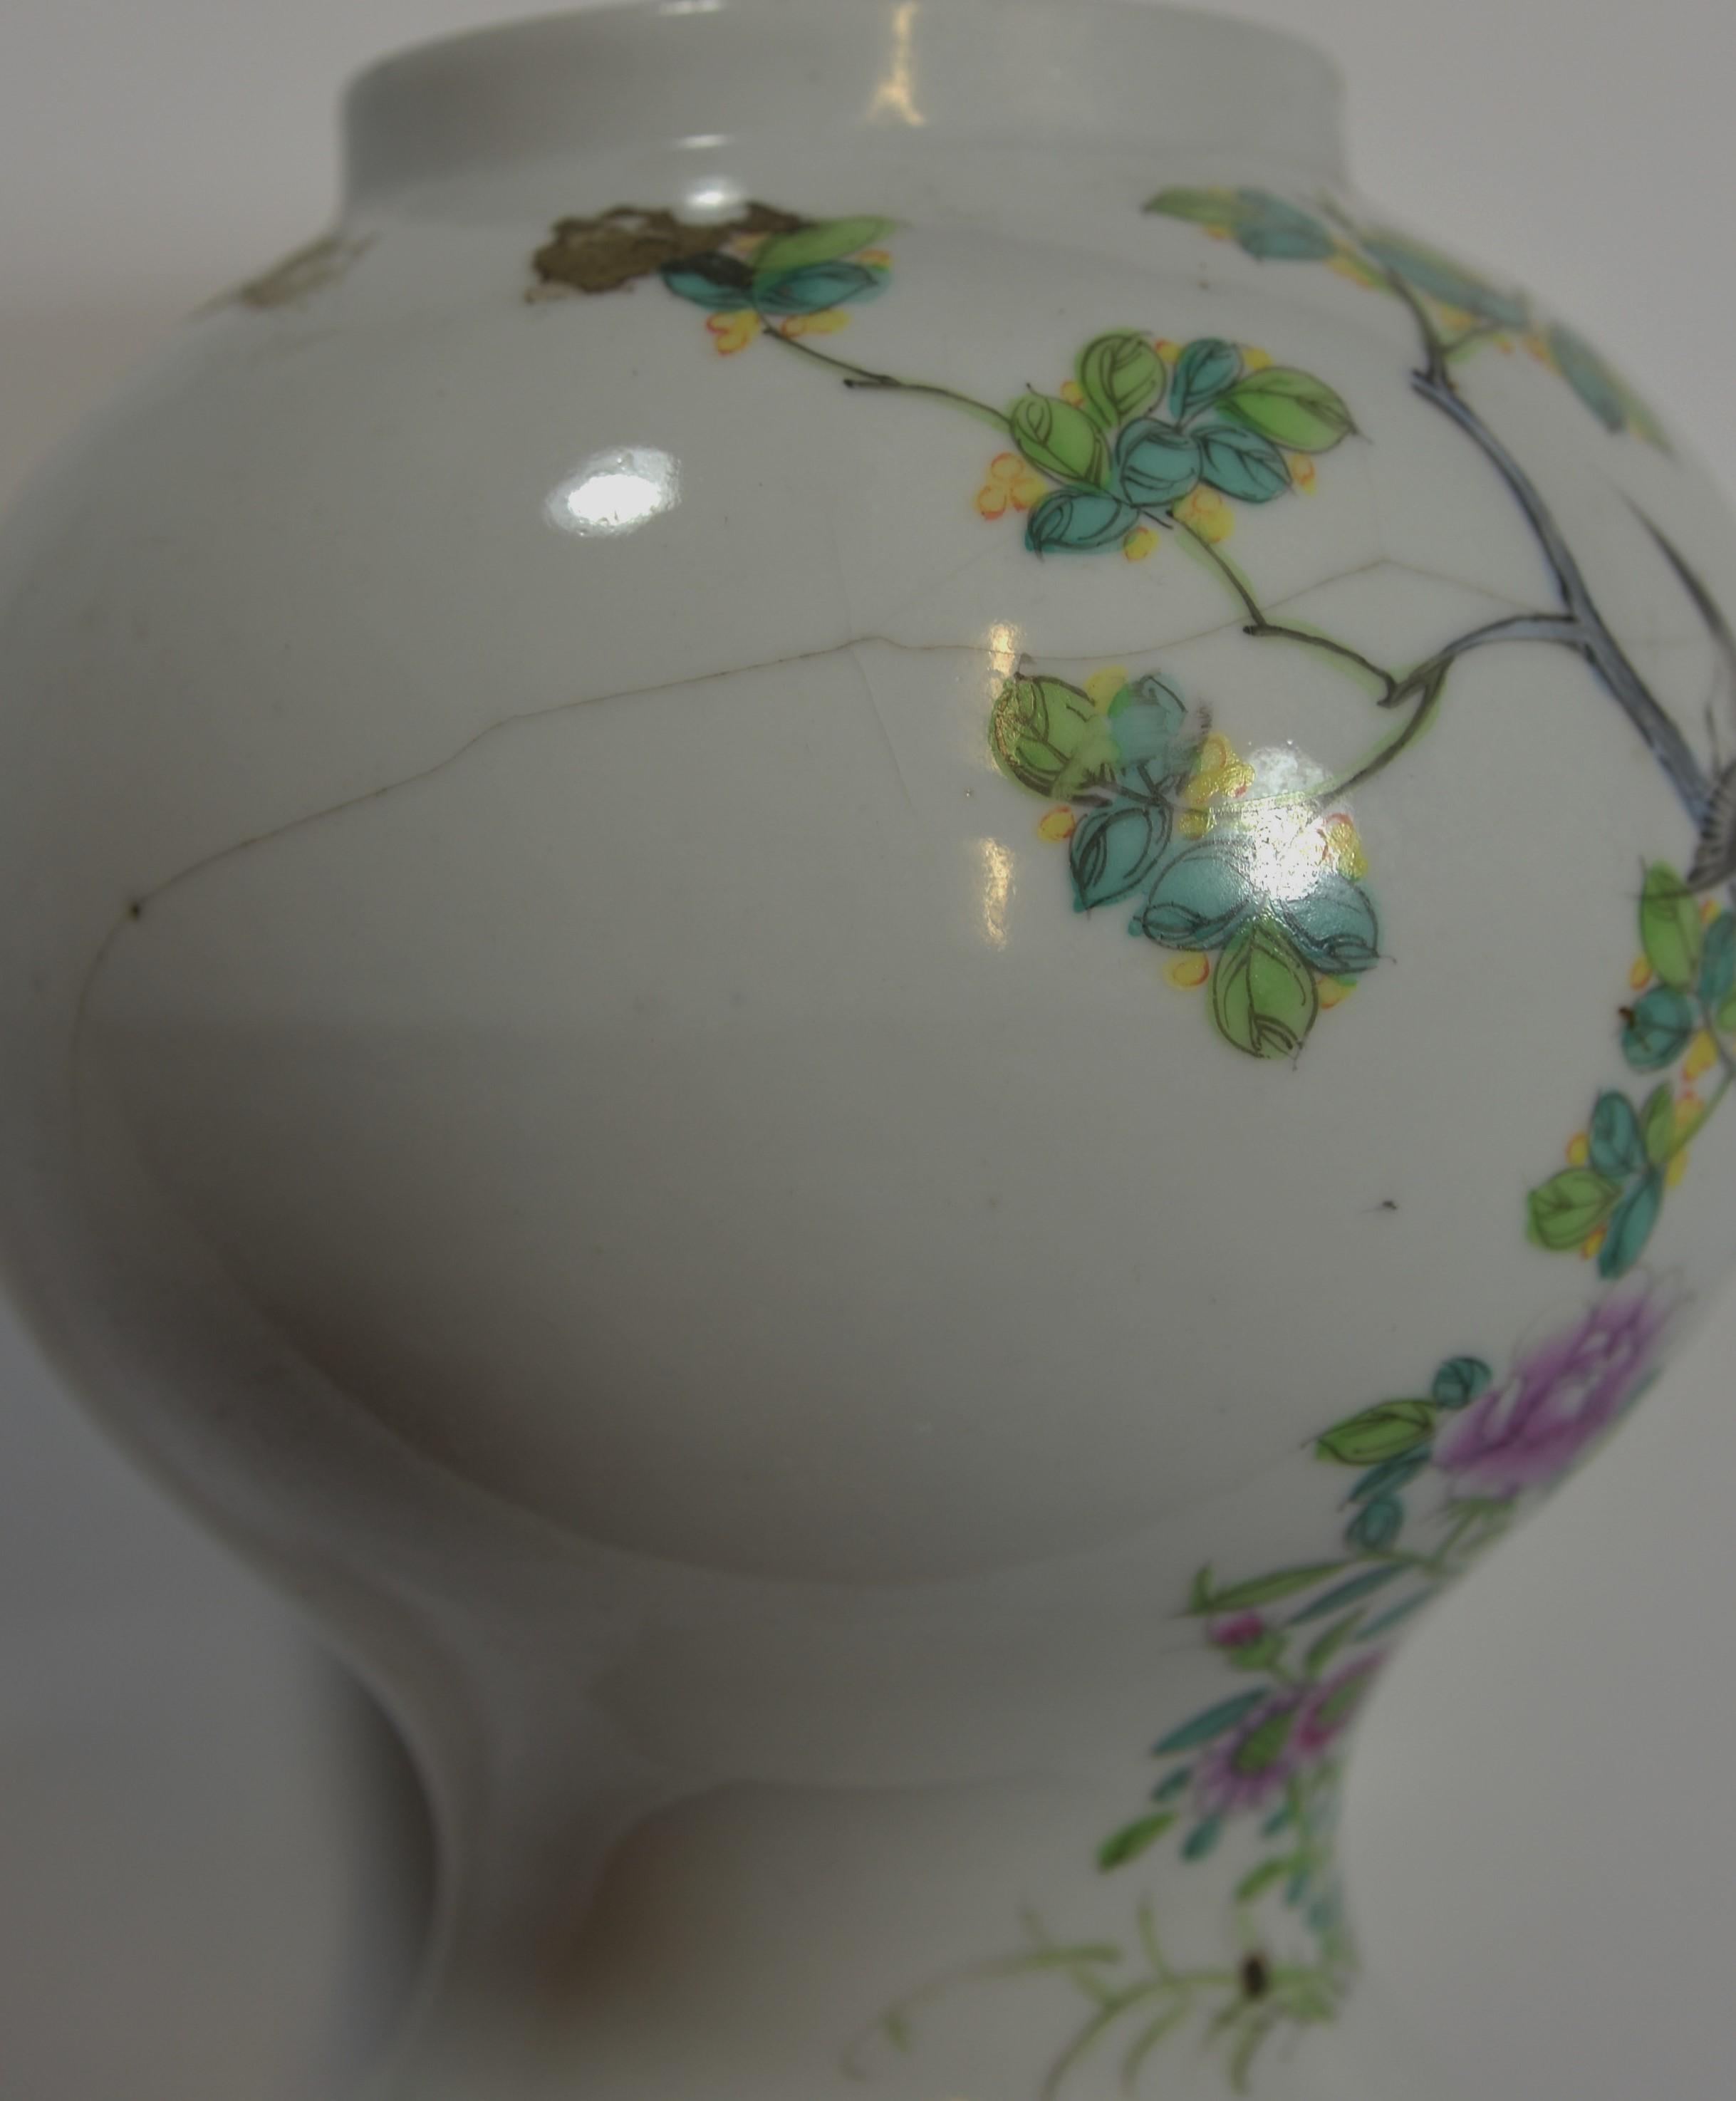 Lot 52 - Two Early 20th century famille rose pots (2) 11-19cm 文初時期 粉彩共两件